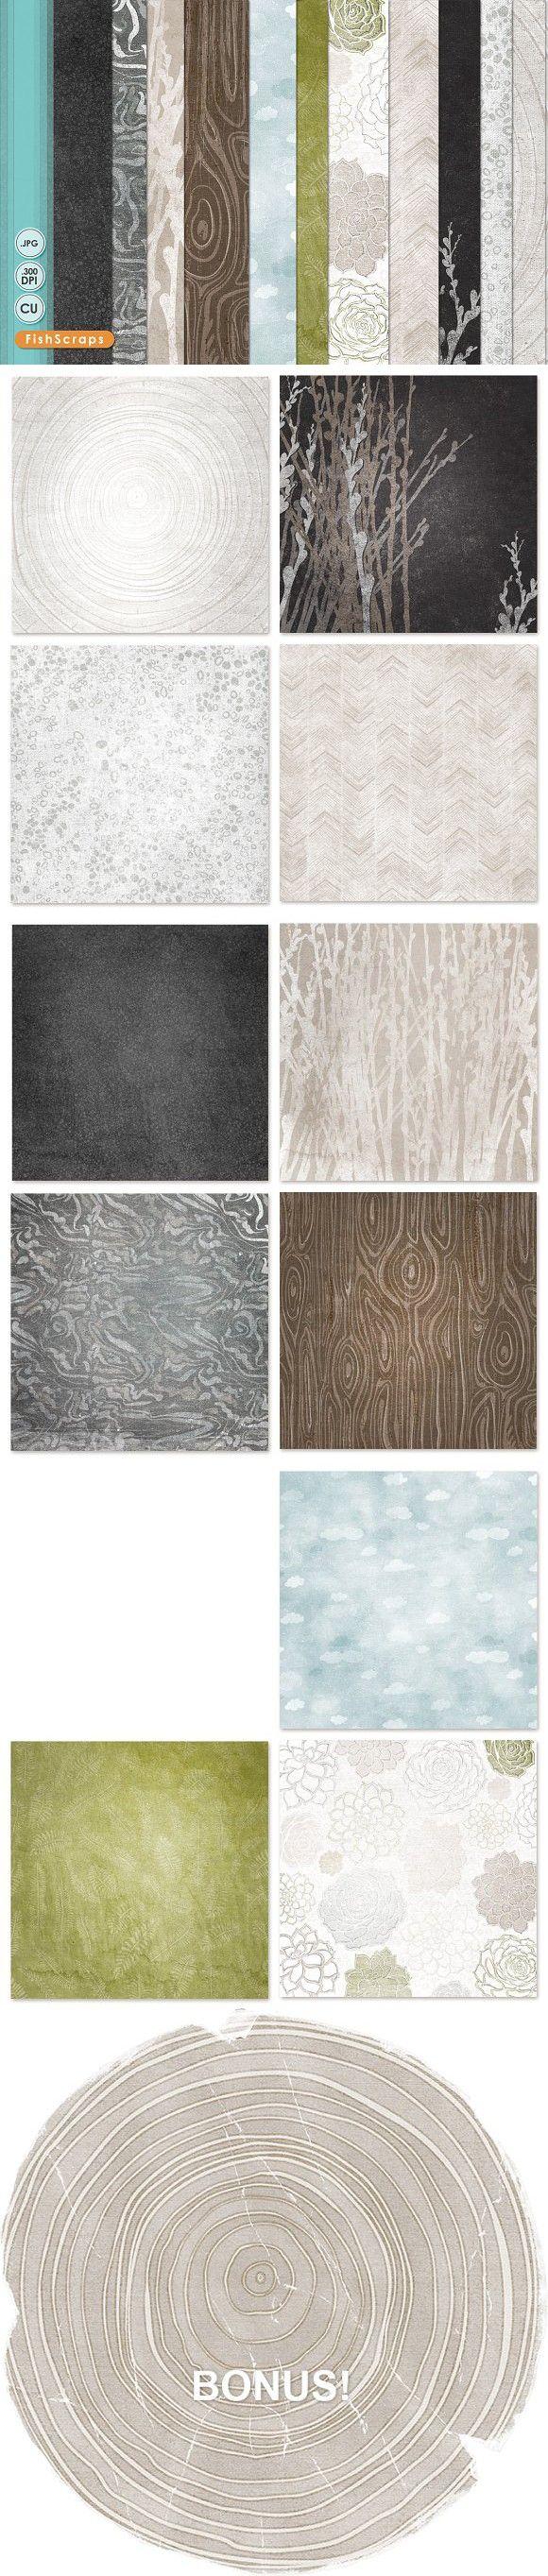 Natural Organic Pattern Paper. Patterns